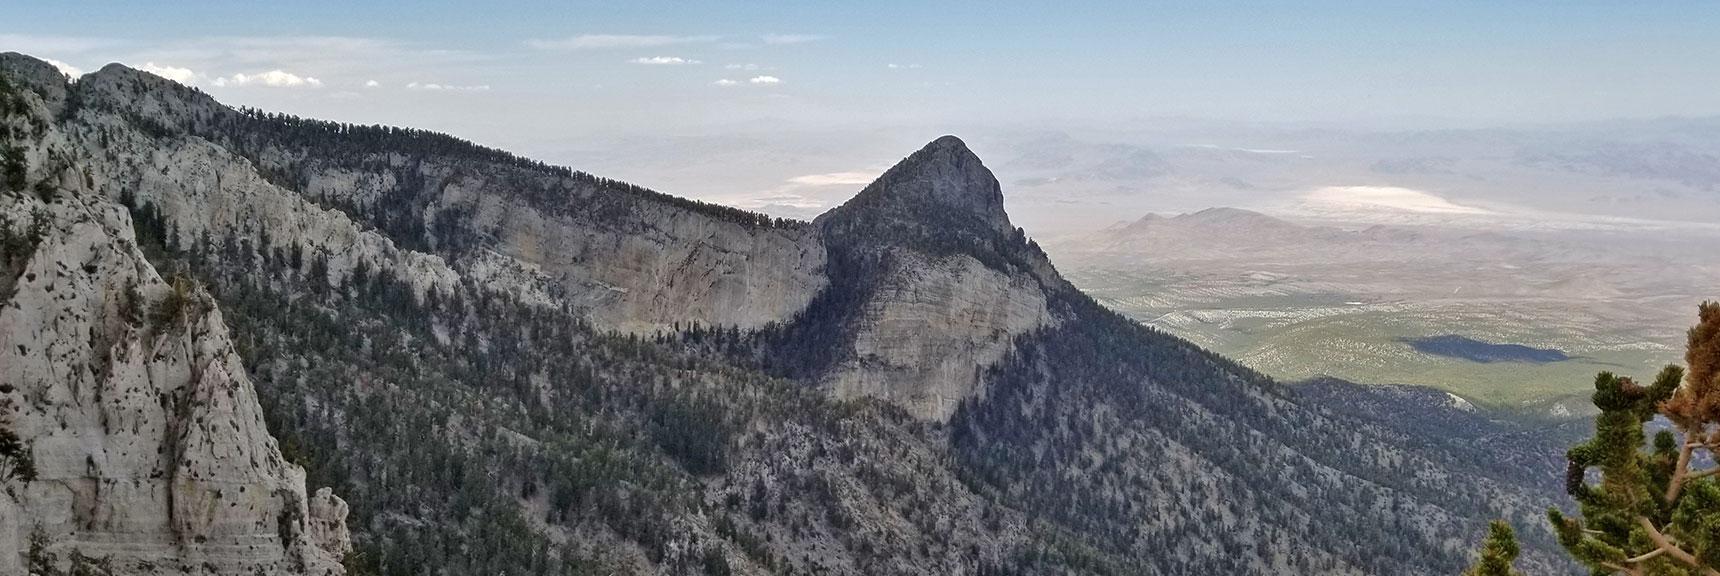 Mummy Mountain's Head Viewed from the Southeast   Mummy Mountain NNE, Mt. Charleston Wilderness, Nevada, Slide 027